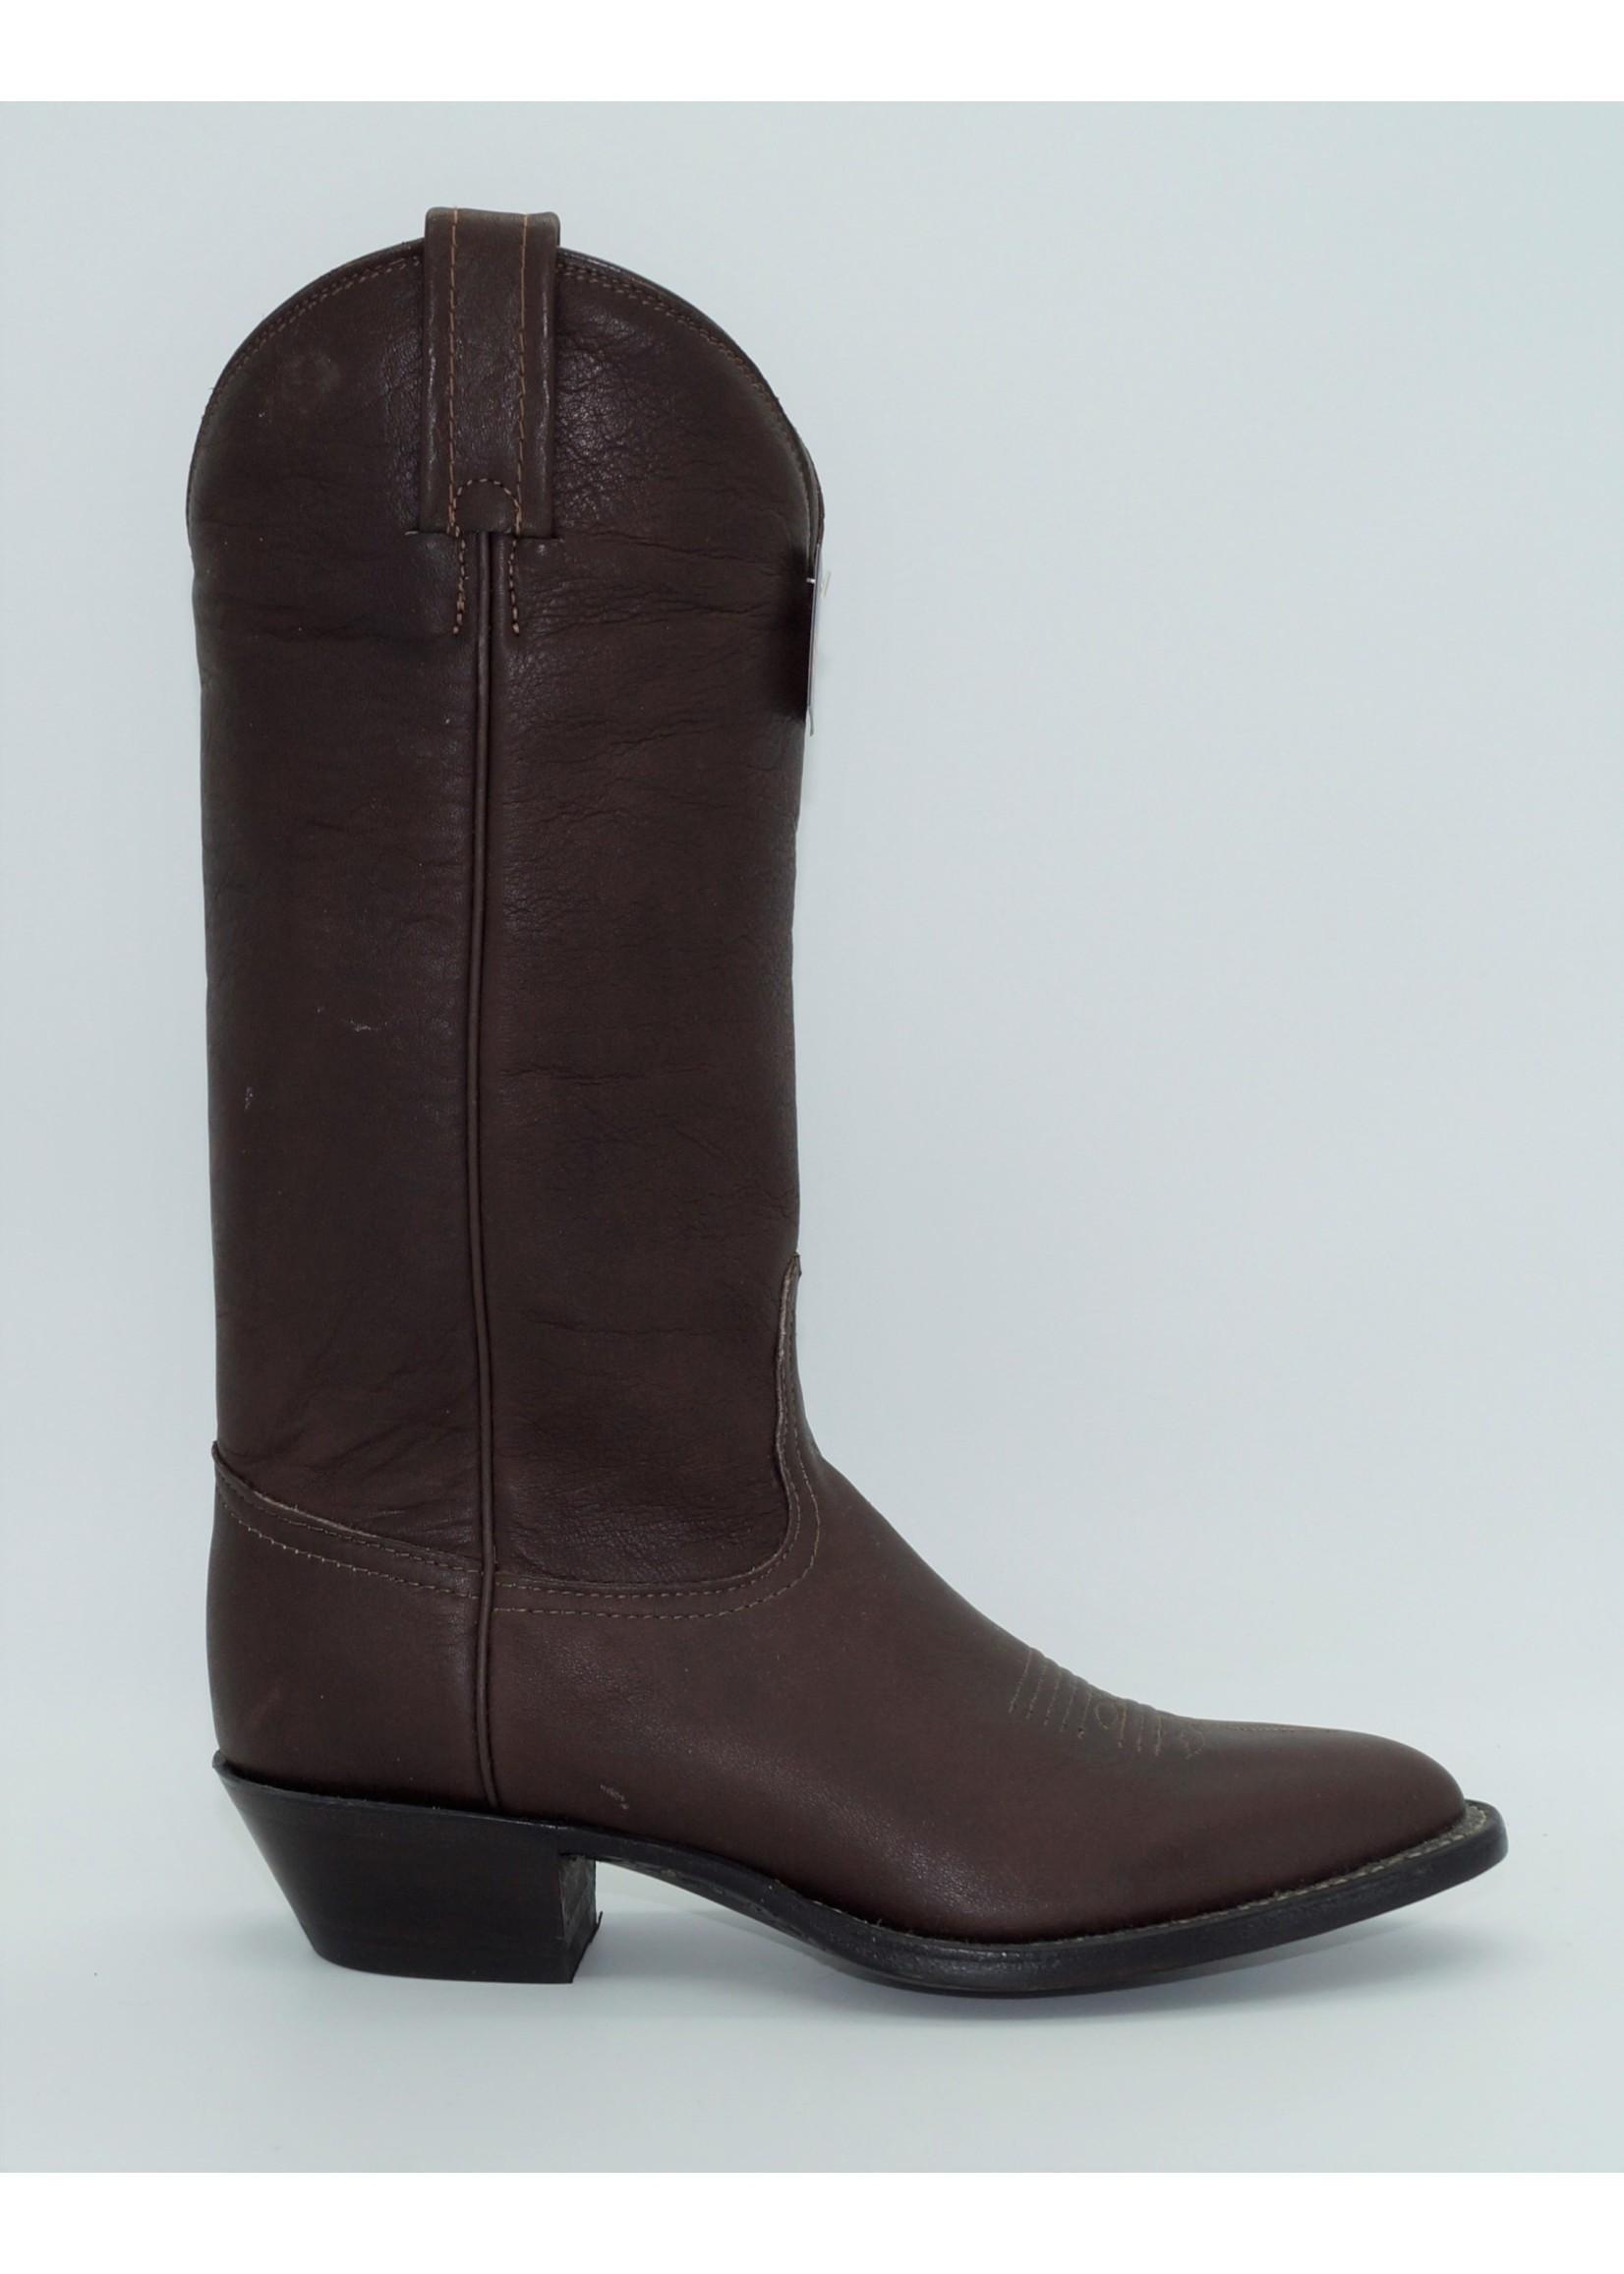 Tony Lama Womens Chocolate Western Boot F1604L